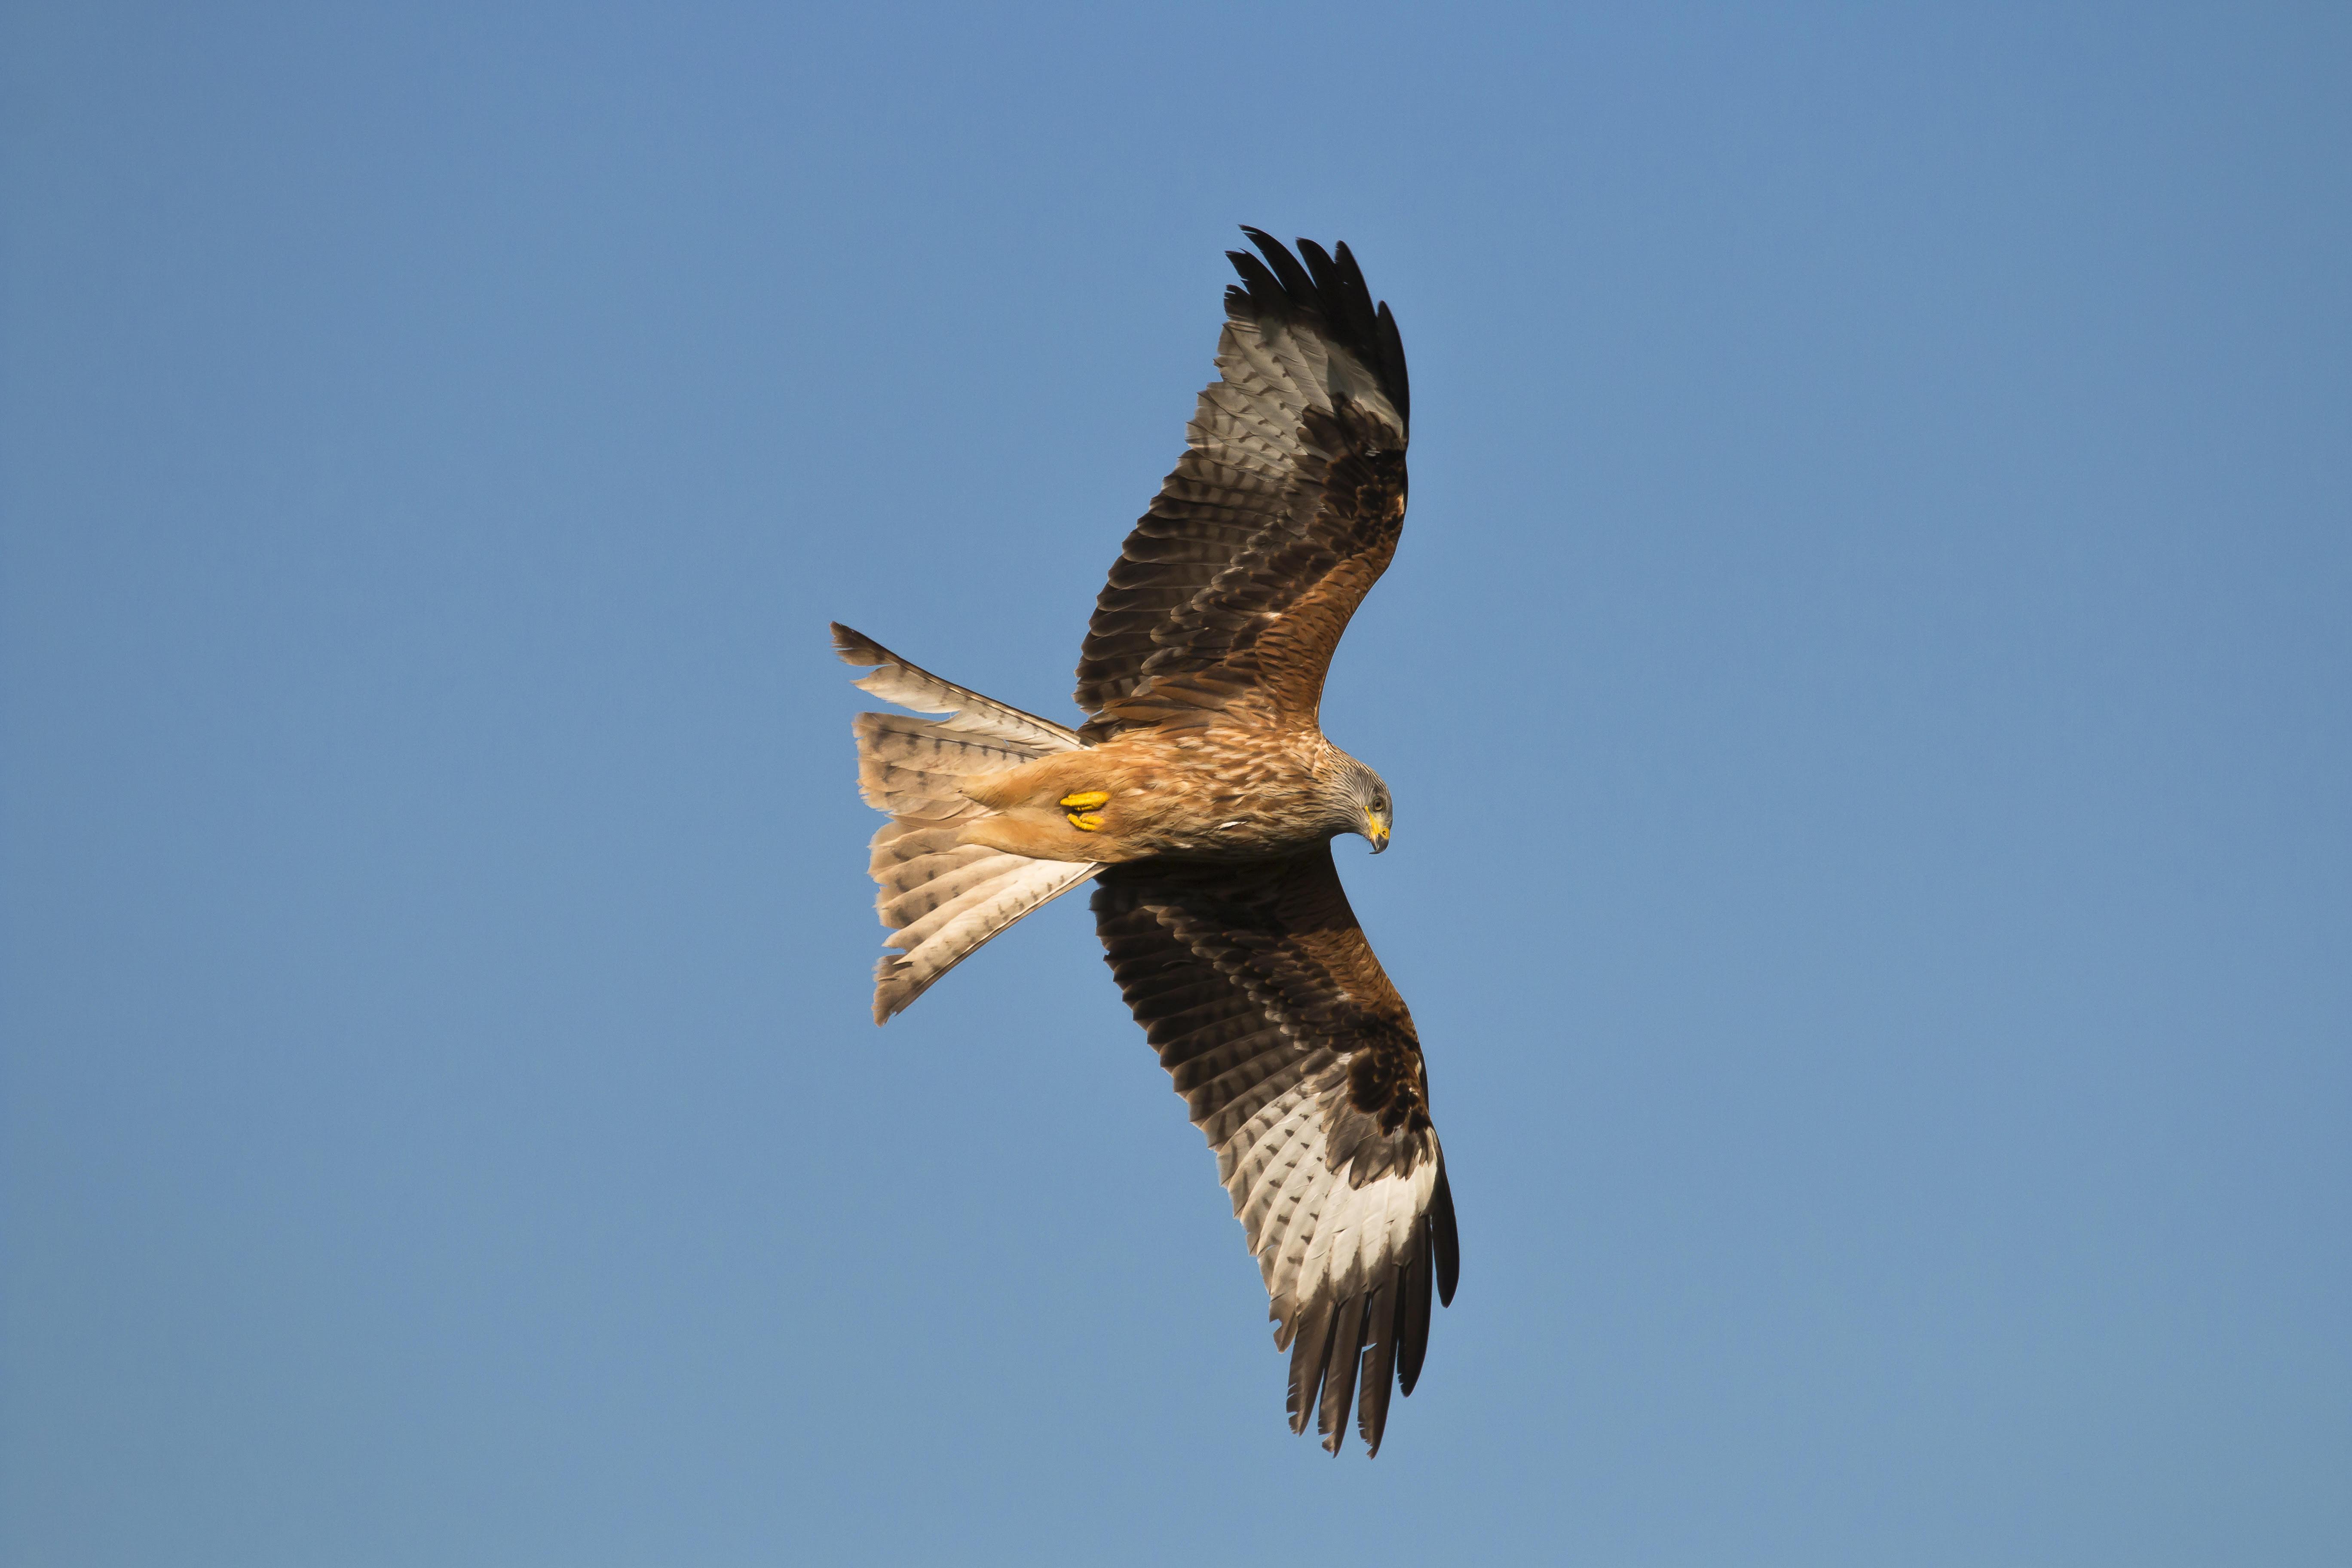 Ficha nº005 de Aves que puedes ver en Guadalajara – Milano Real (Milvus milvus)